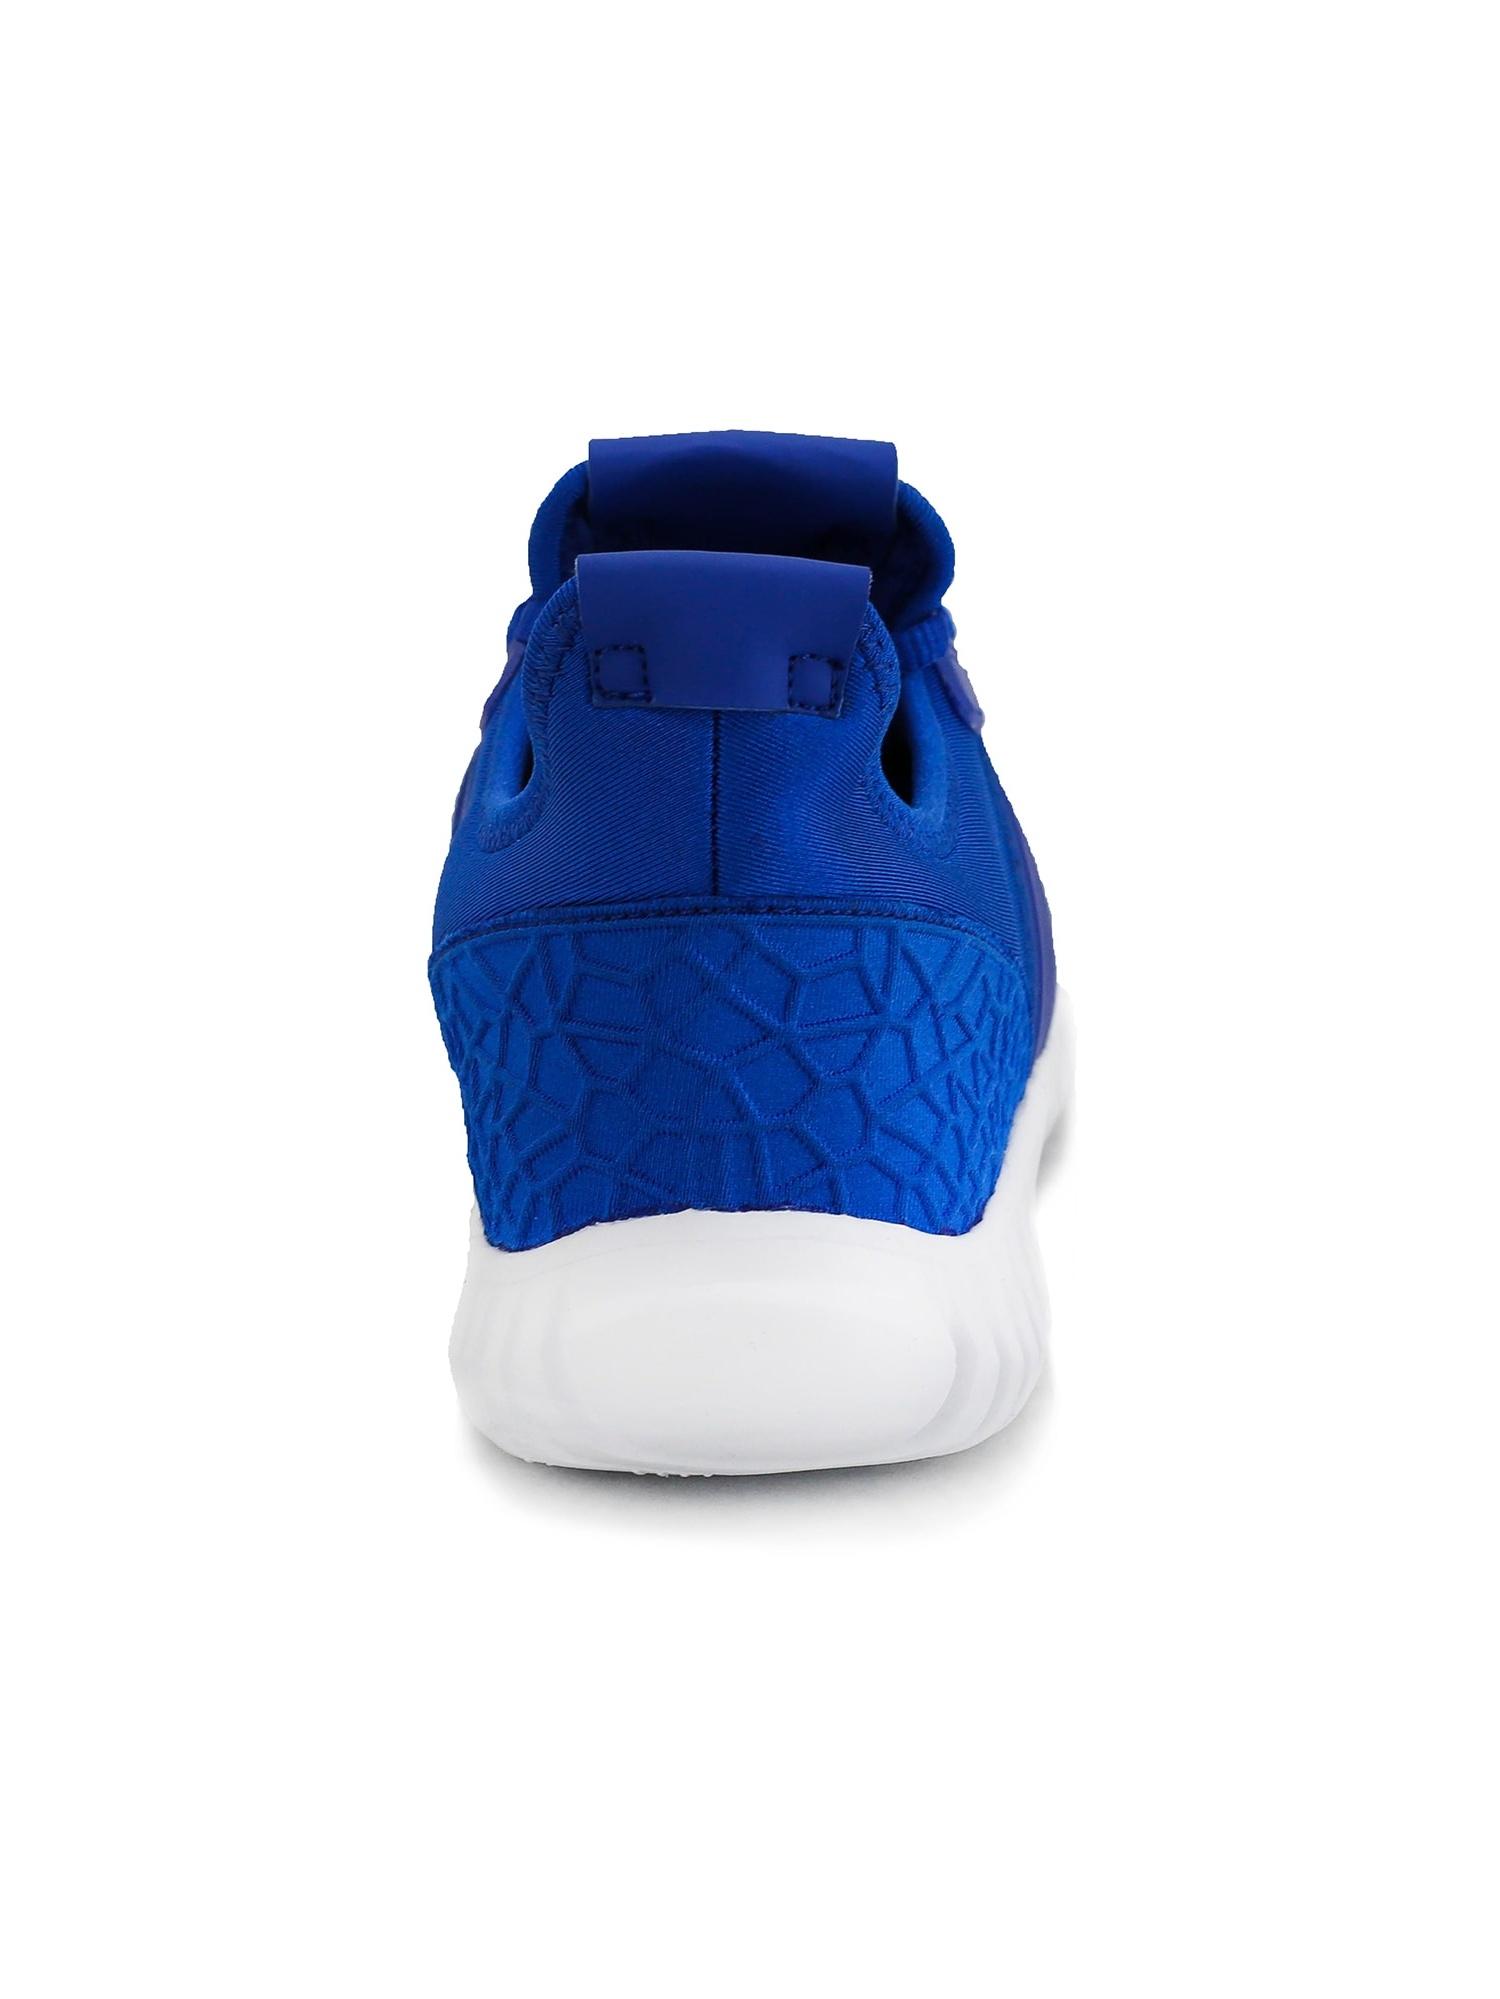 XRAY  Kikmo Medium-width Sneaker Economical, stylish, and eye-catching shoes